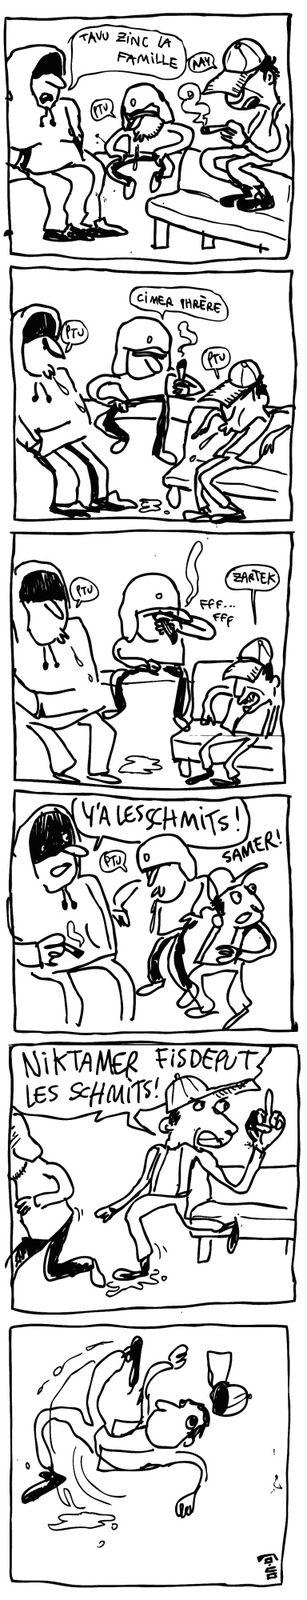 schmits